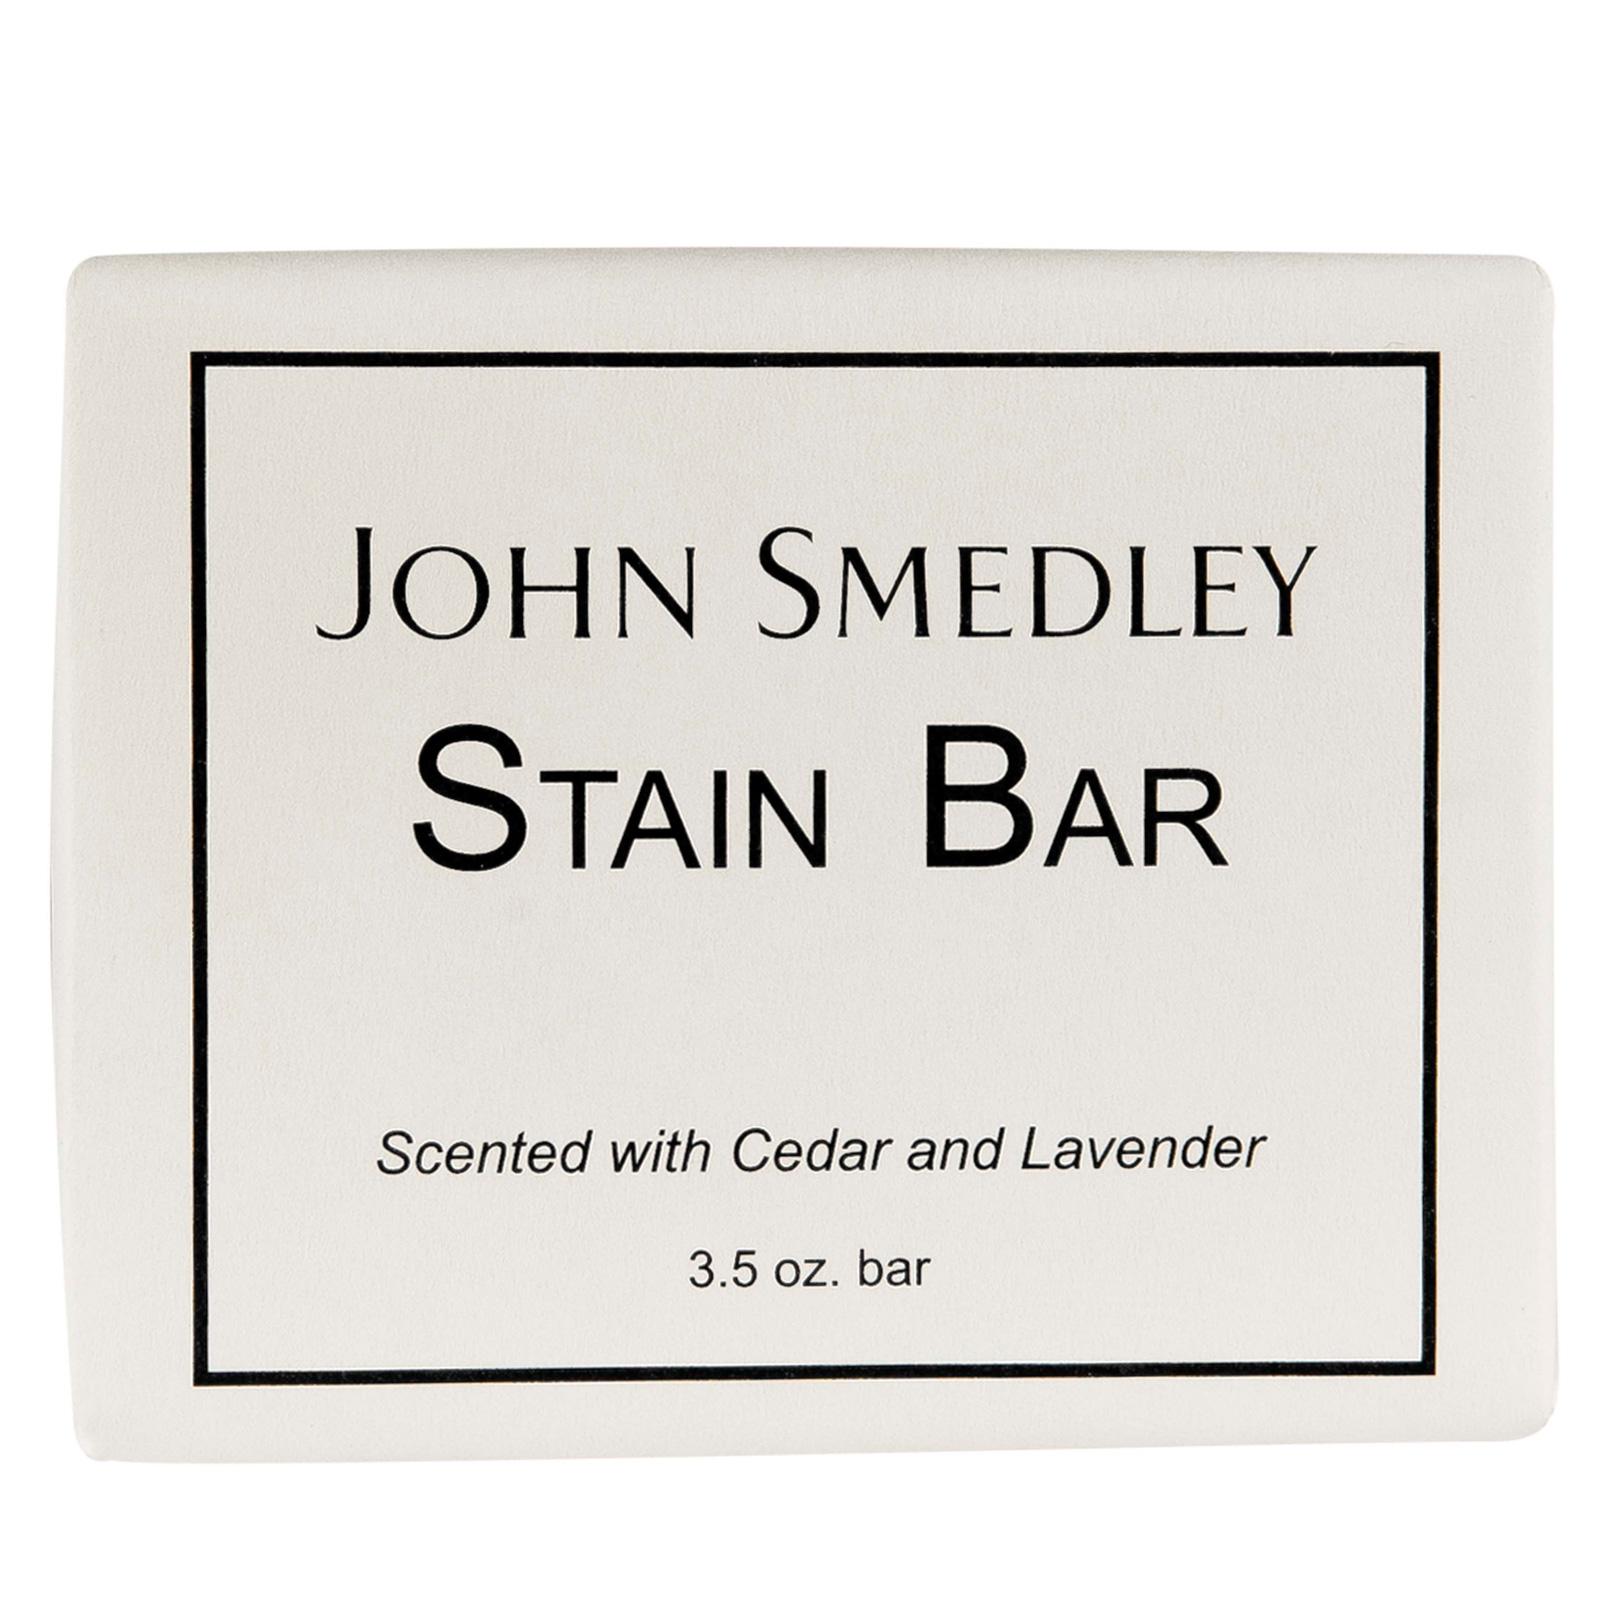 John Smedley Stain Bar (3.5 oz)